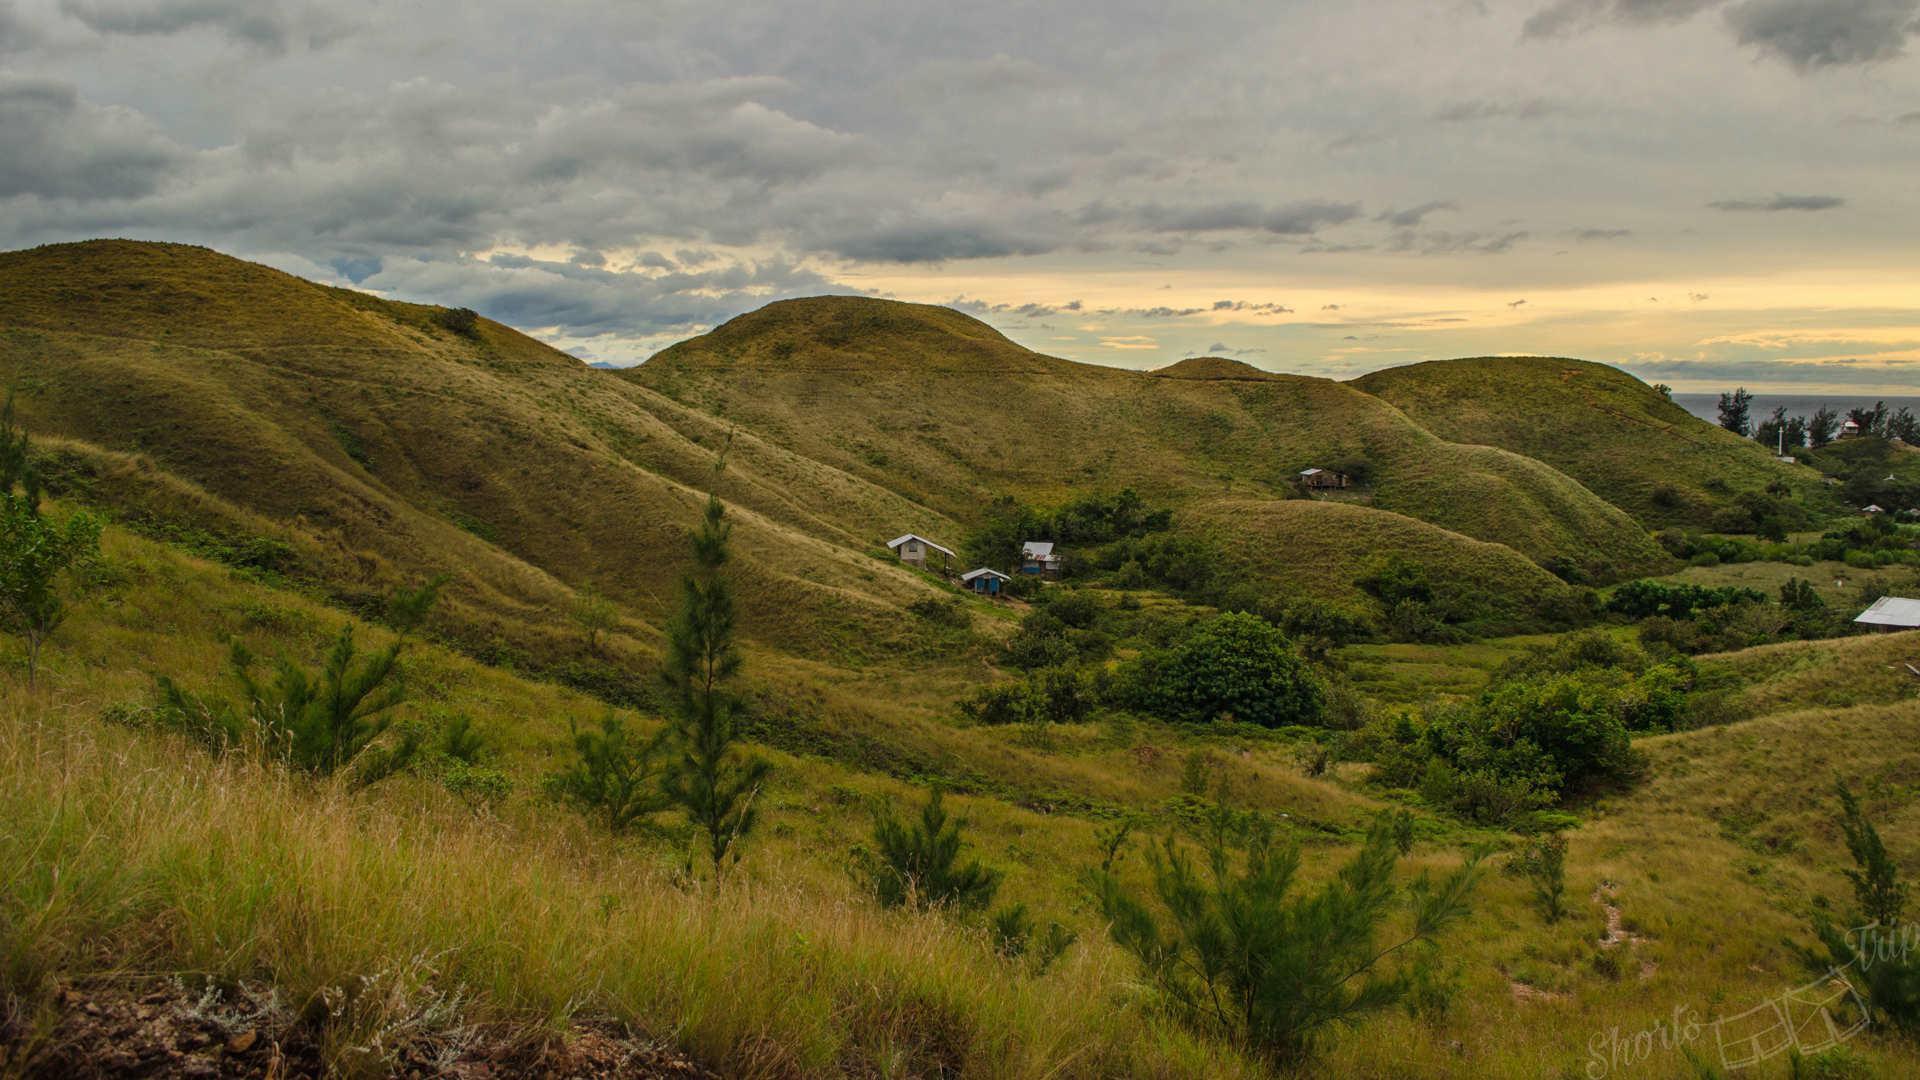 mararison, mararison island, malalison hike, mararison hike